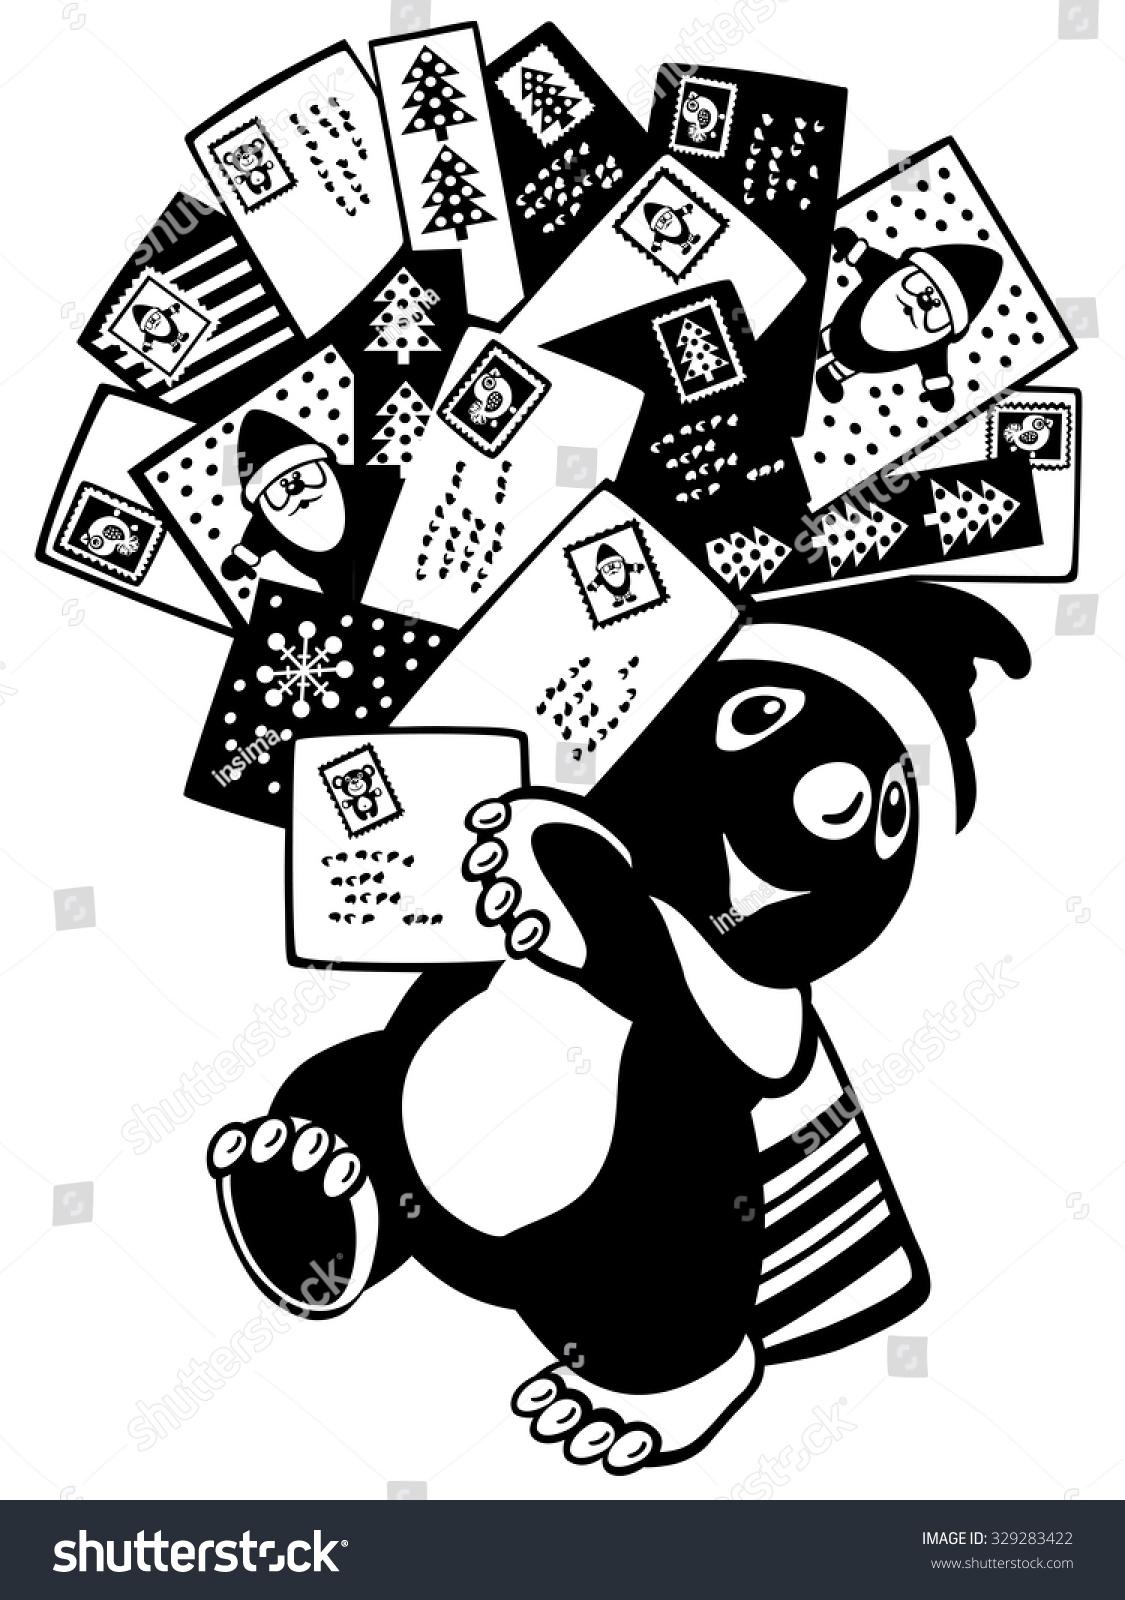 Cartoon Mole Holding Christmas Greeting Cards Stock Photo Photo